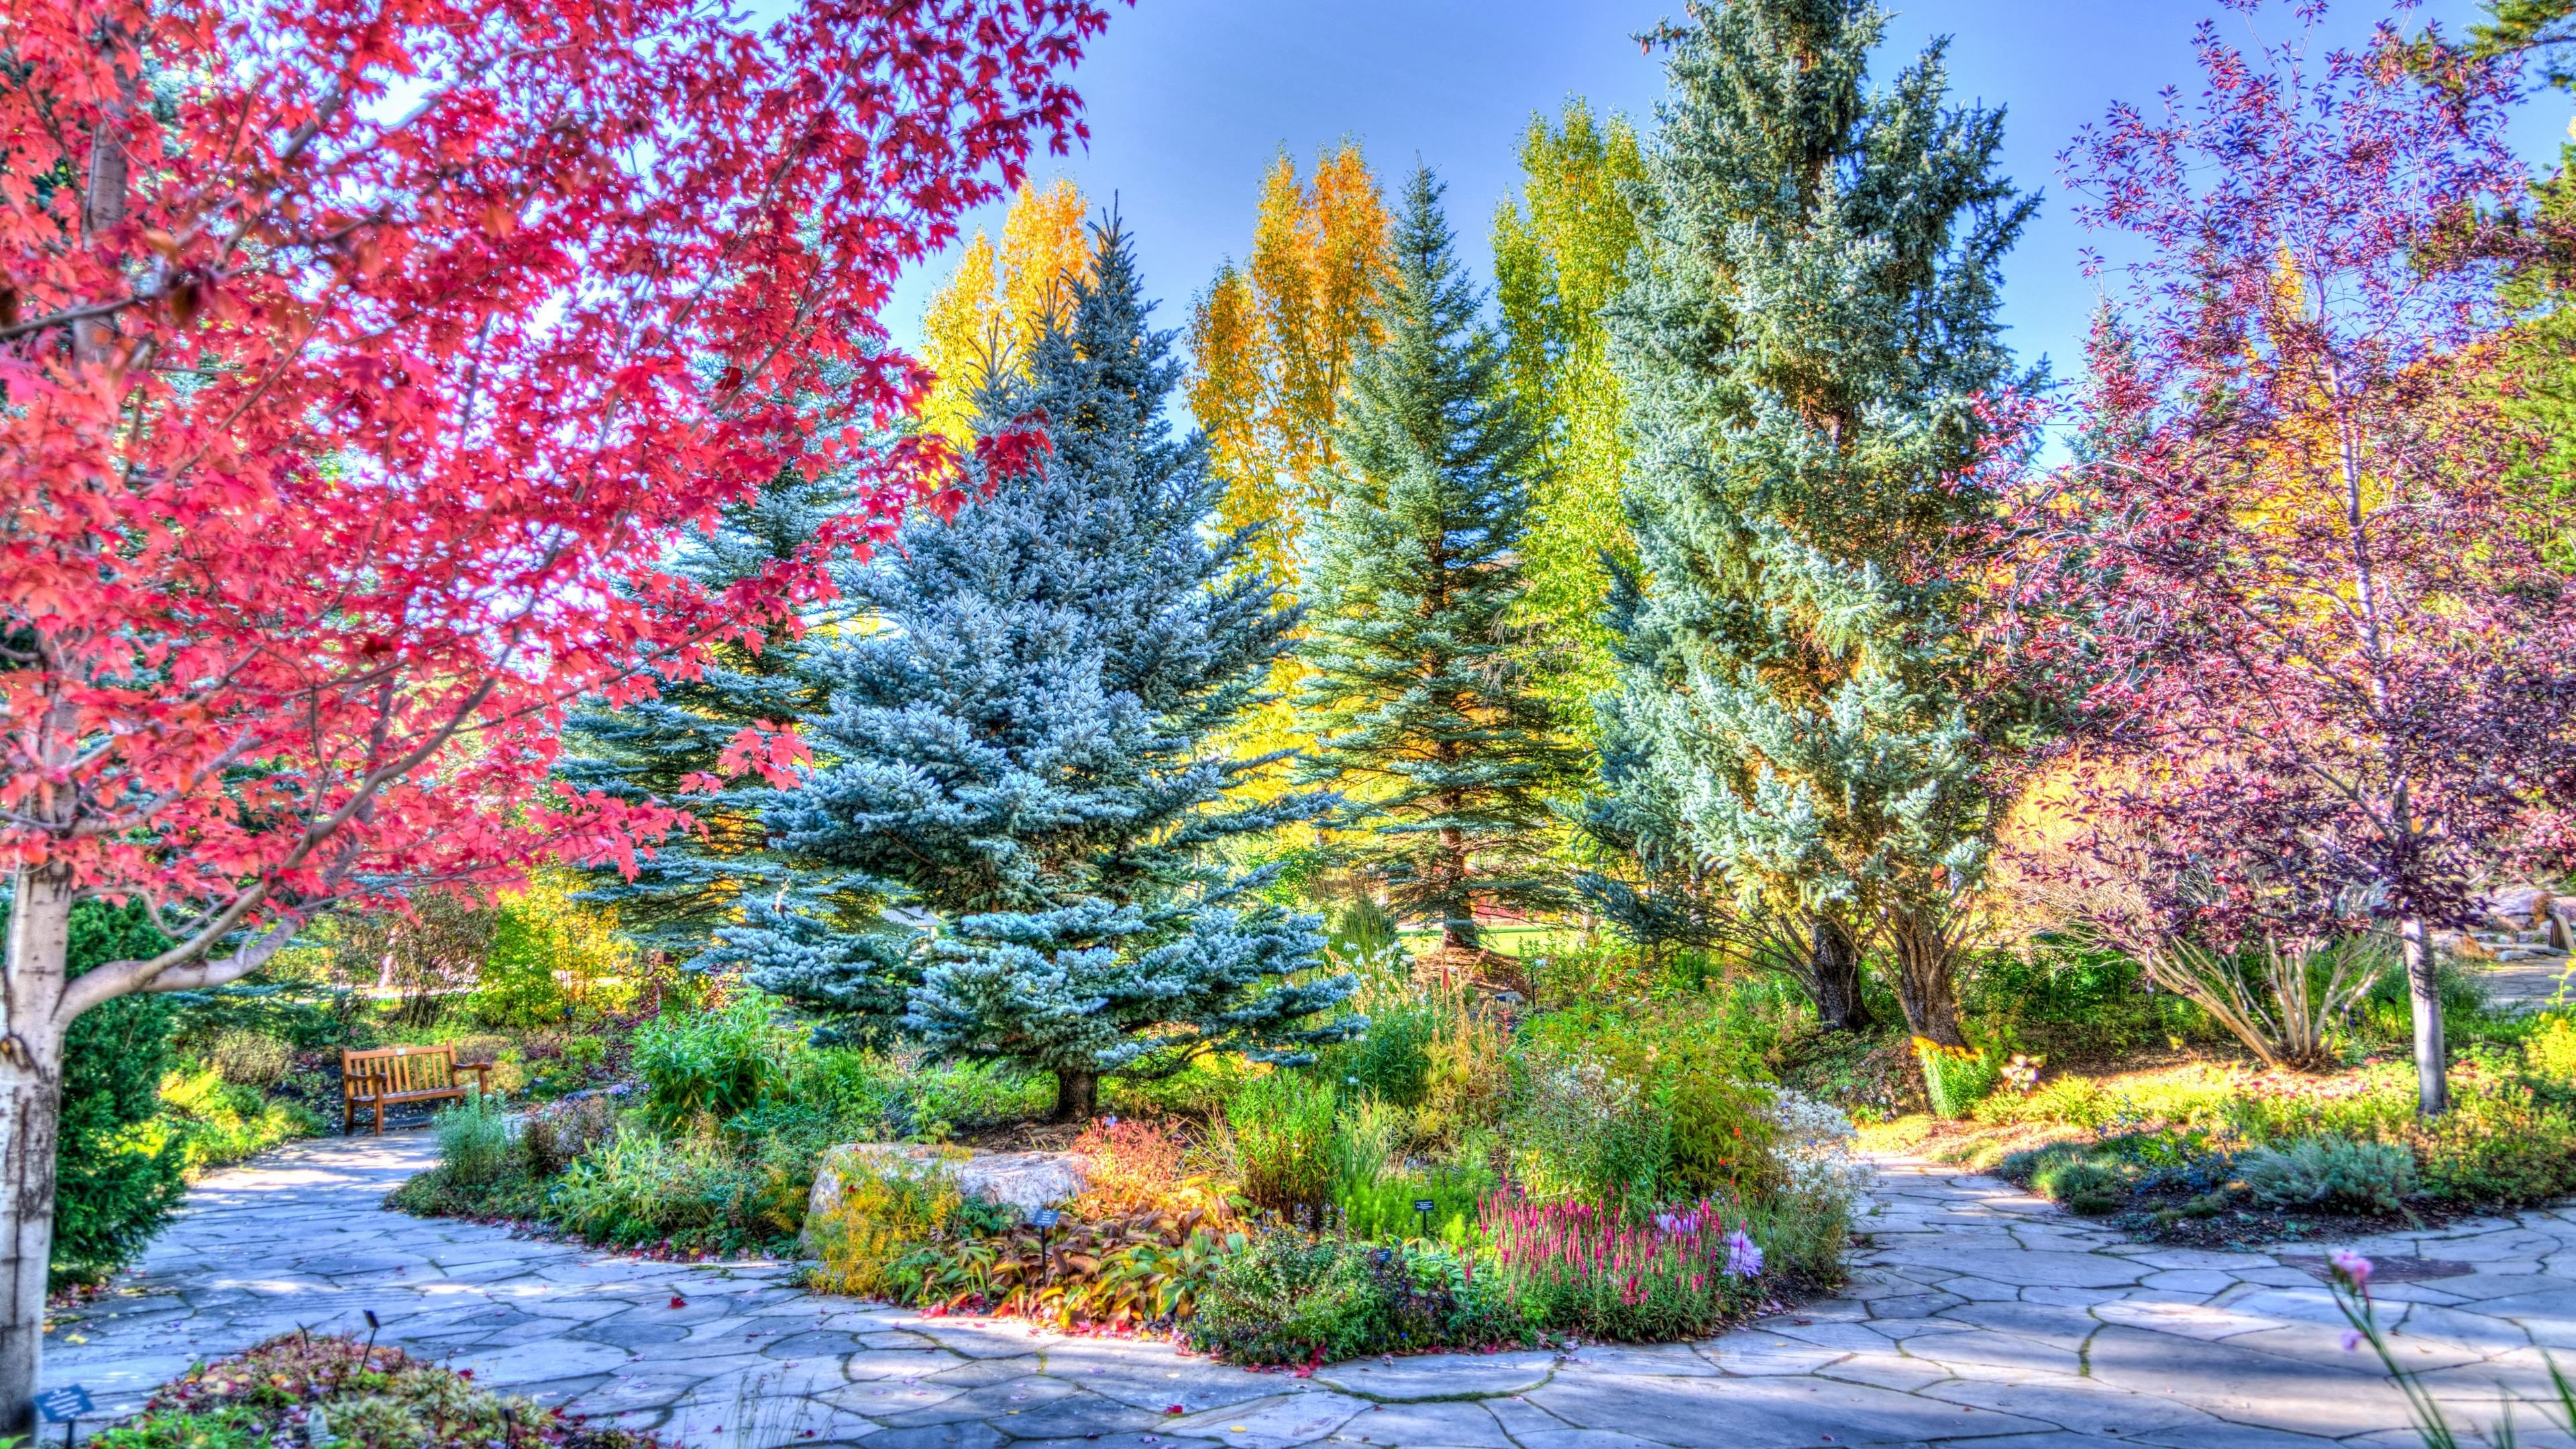 vejle colorado park hdr 4k 1541113985 - vejle, colorado, park, hdr 4k - vejle, Park, Colorado